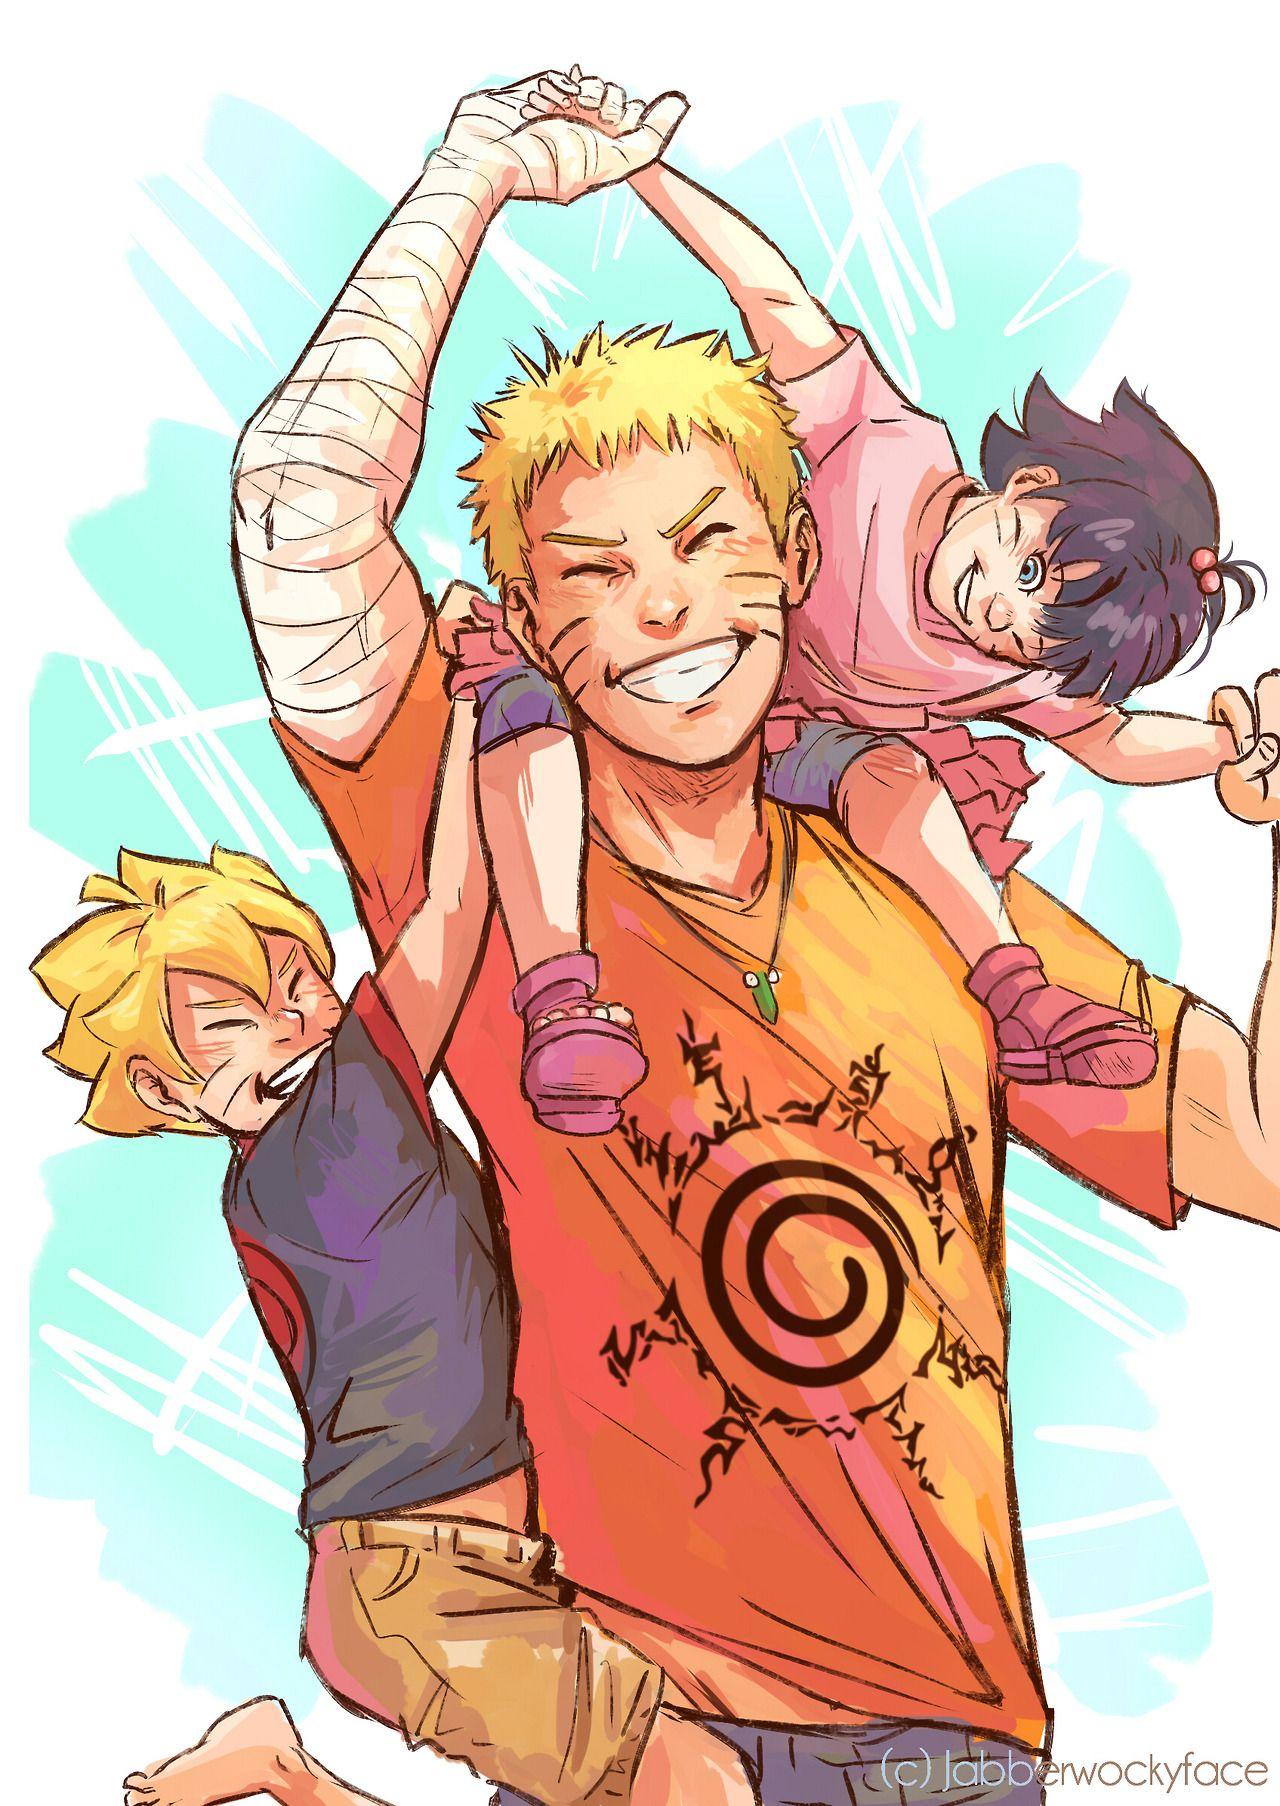 Tags: Fanart, NARUTO, Uzumaki Naruto, Tumblr, Uzumaki ...